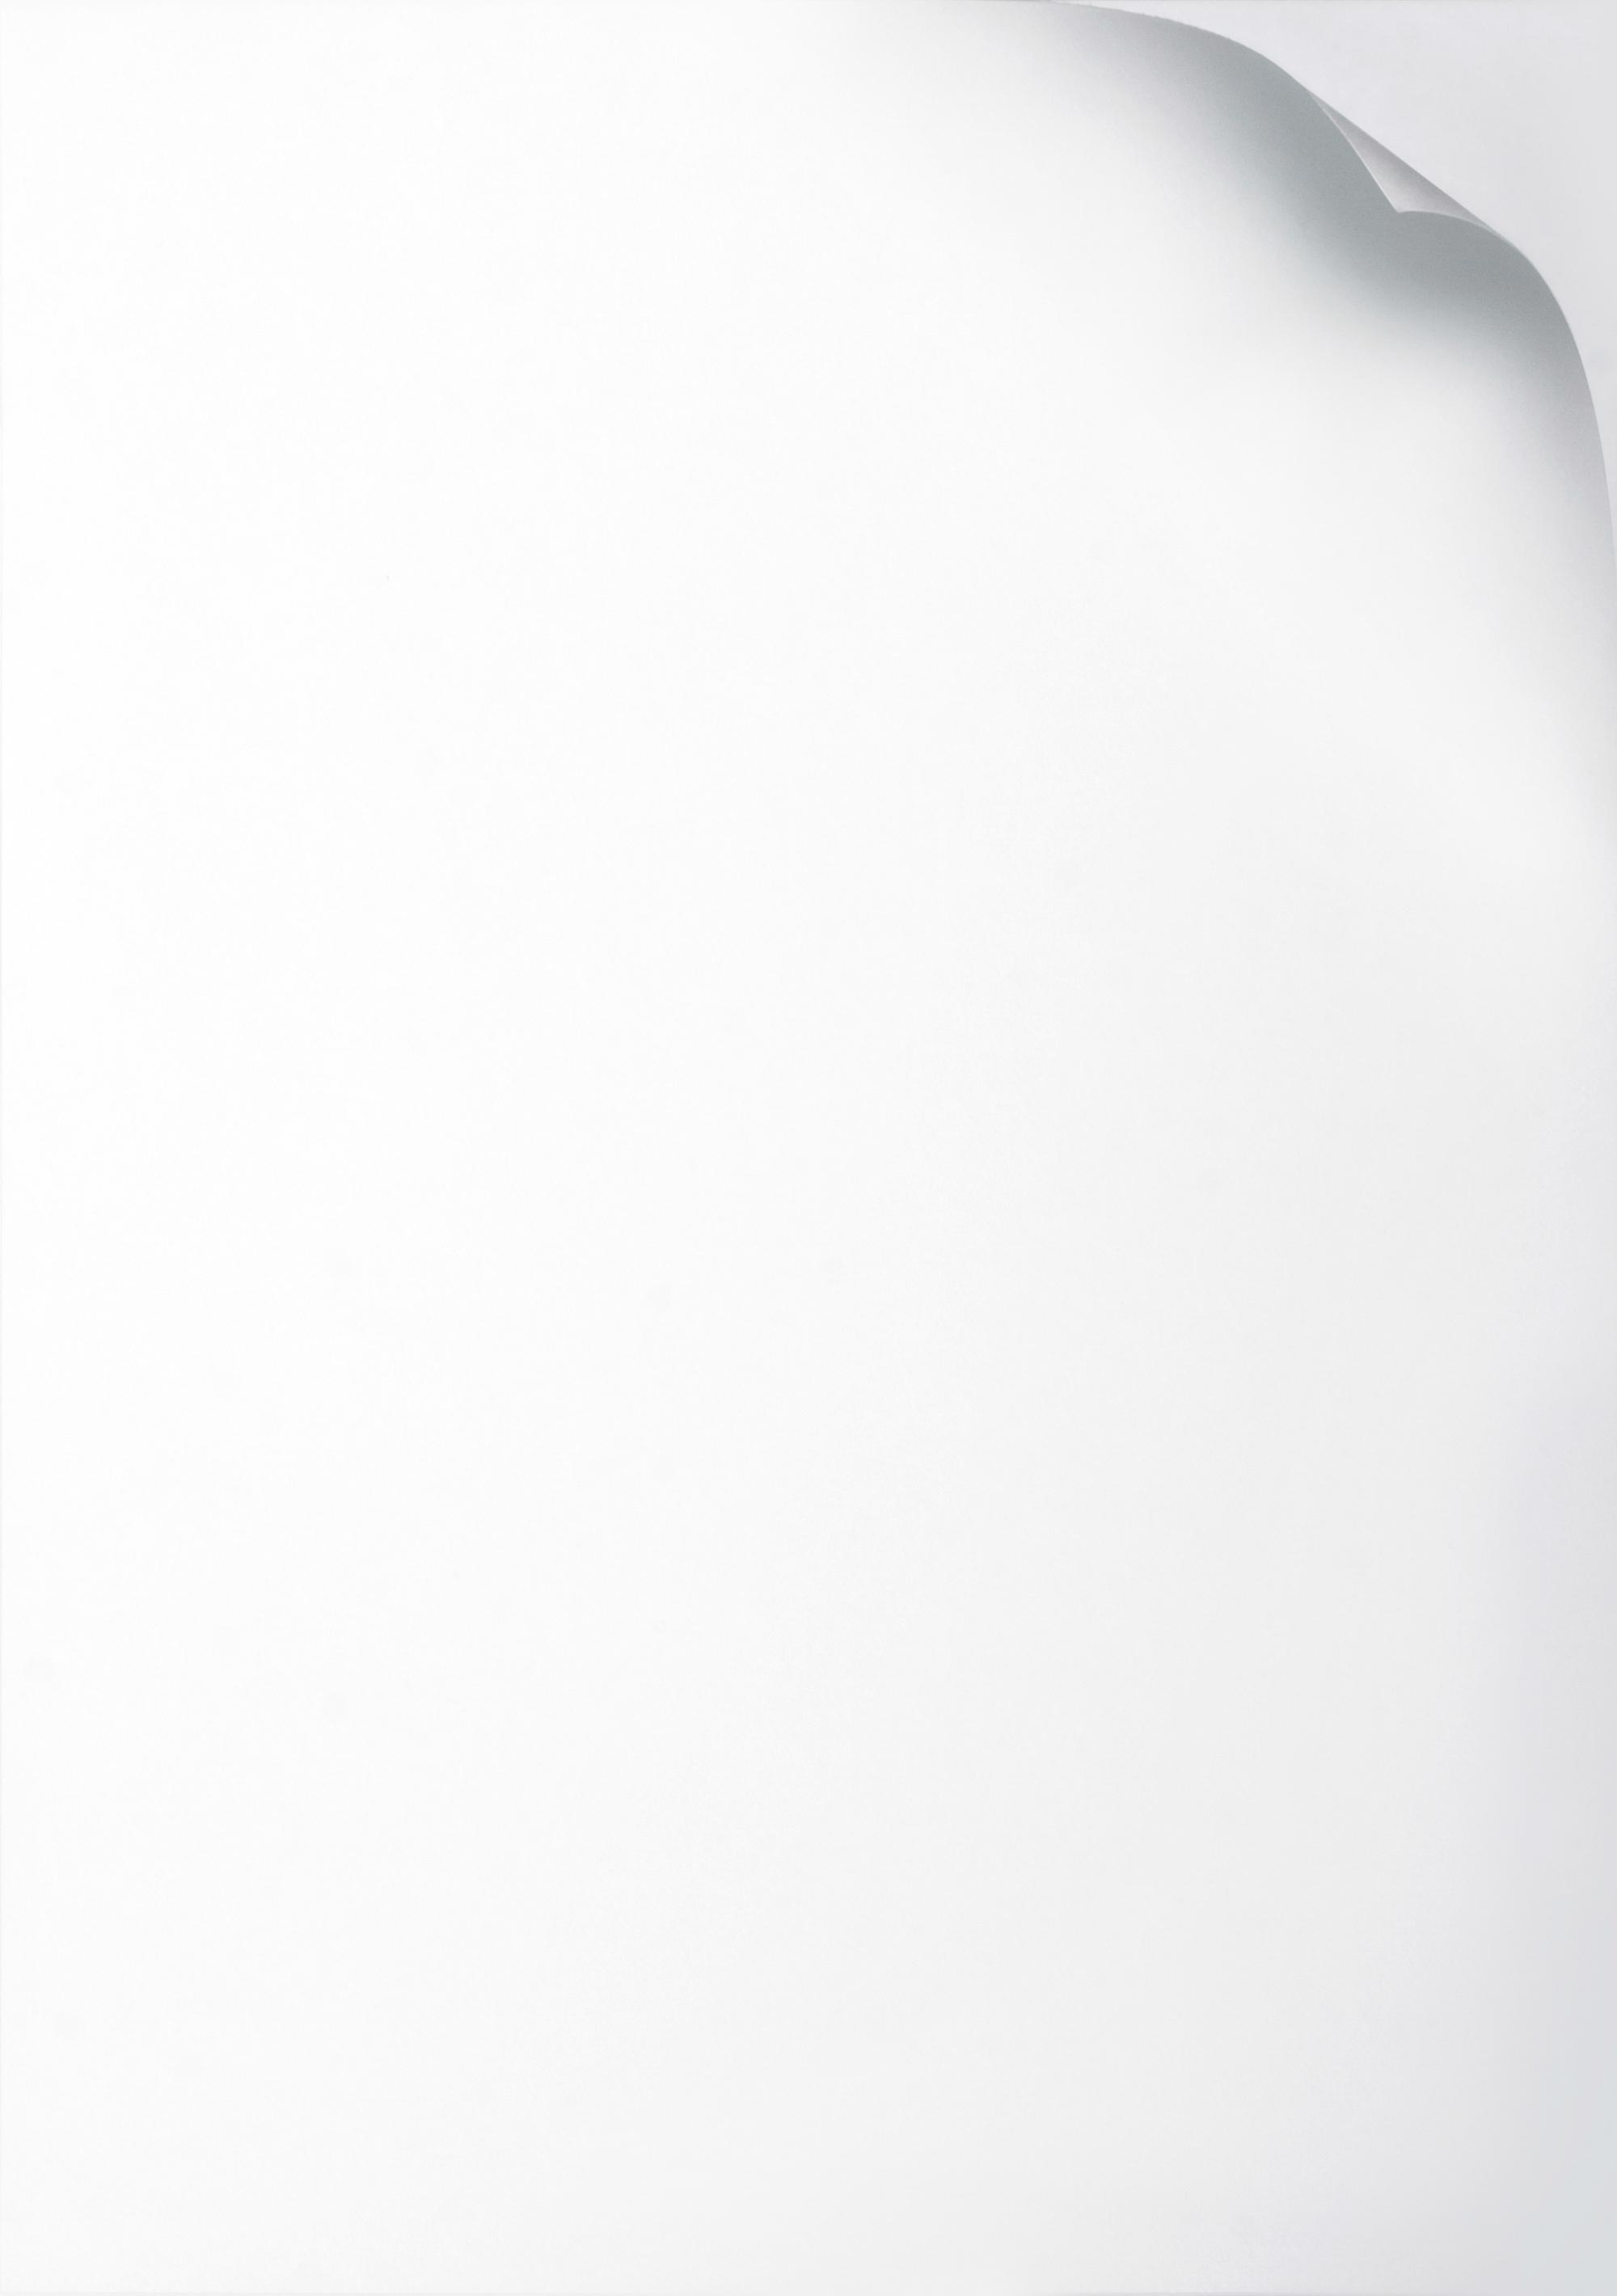 Paper page, White, Bend, Transparent, Three-dimensiona, HQ Photo